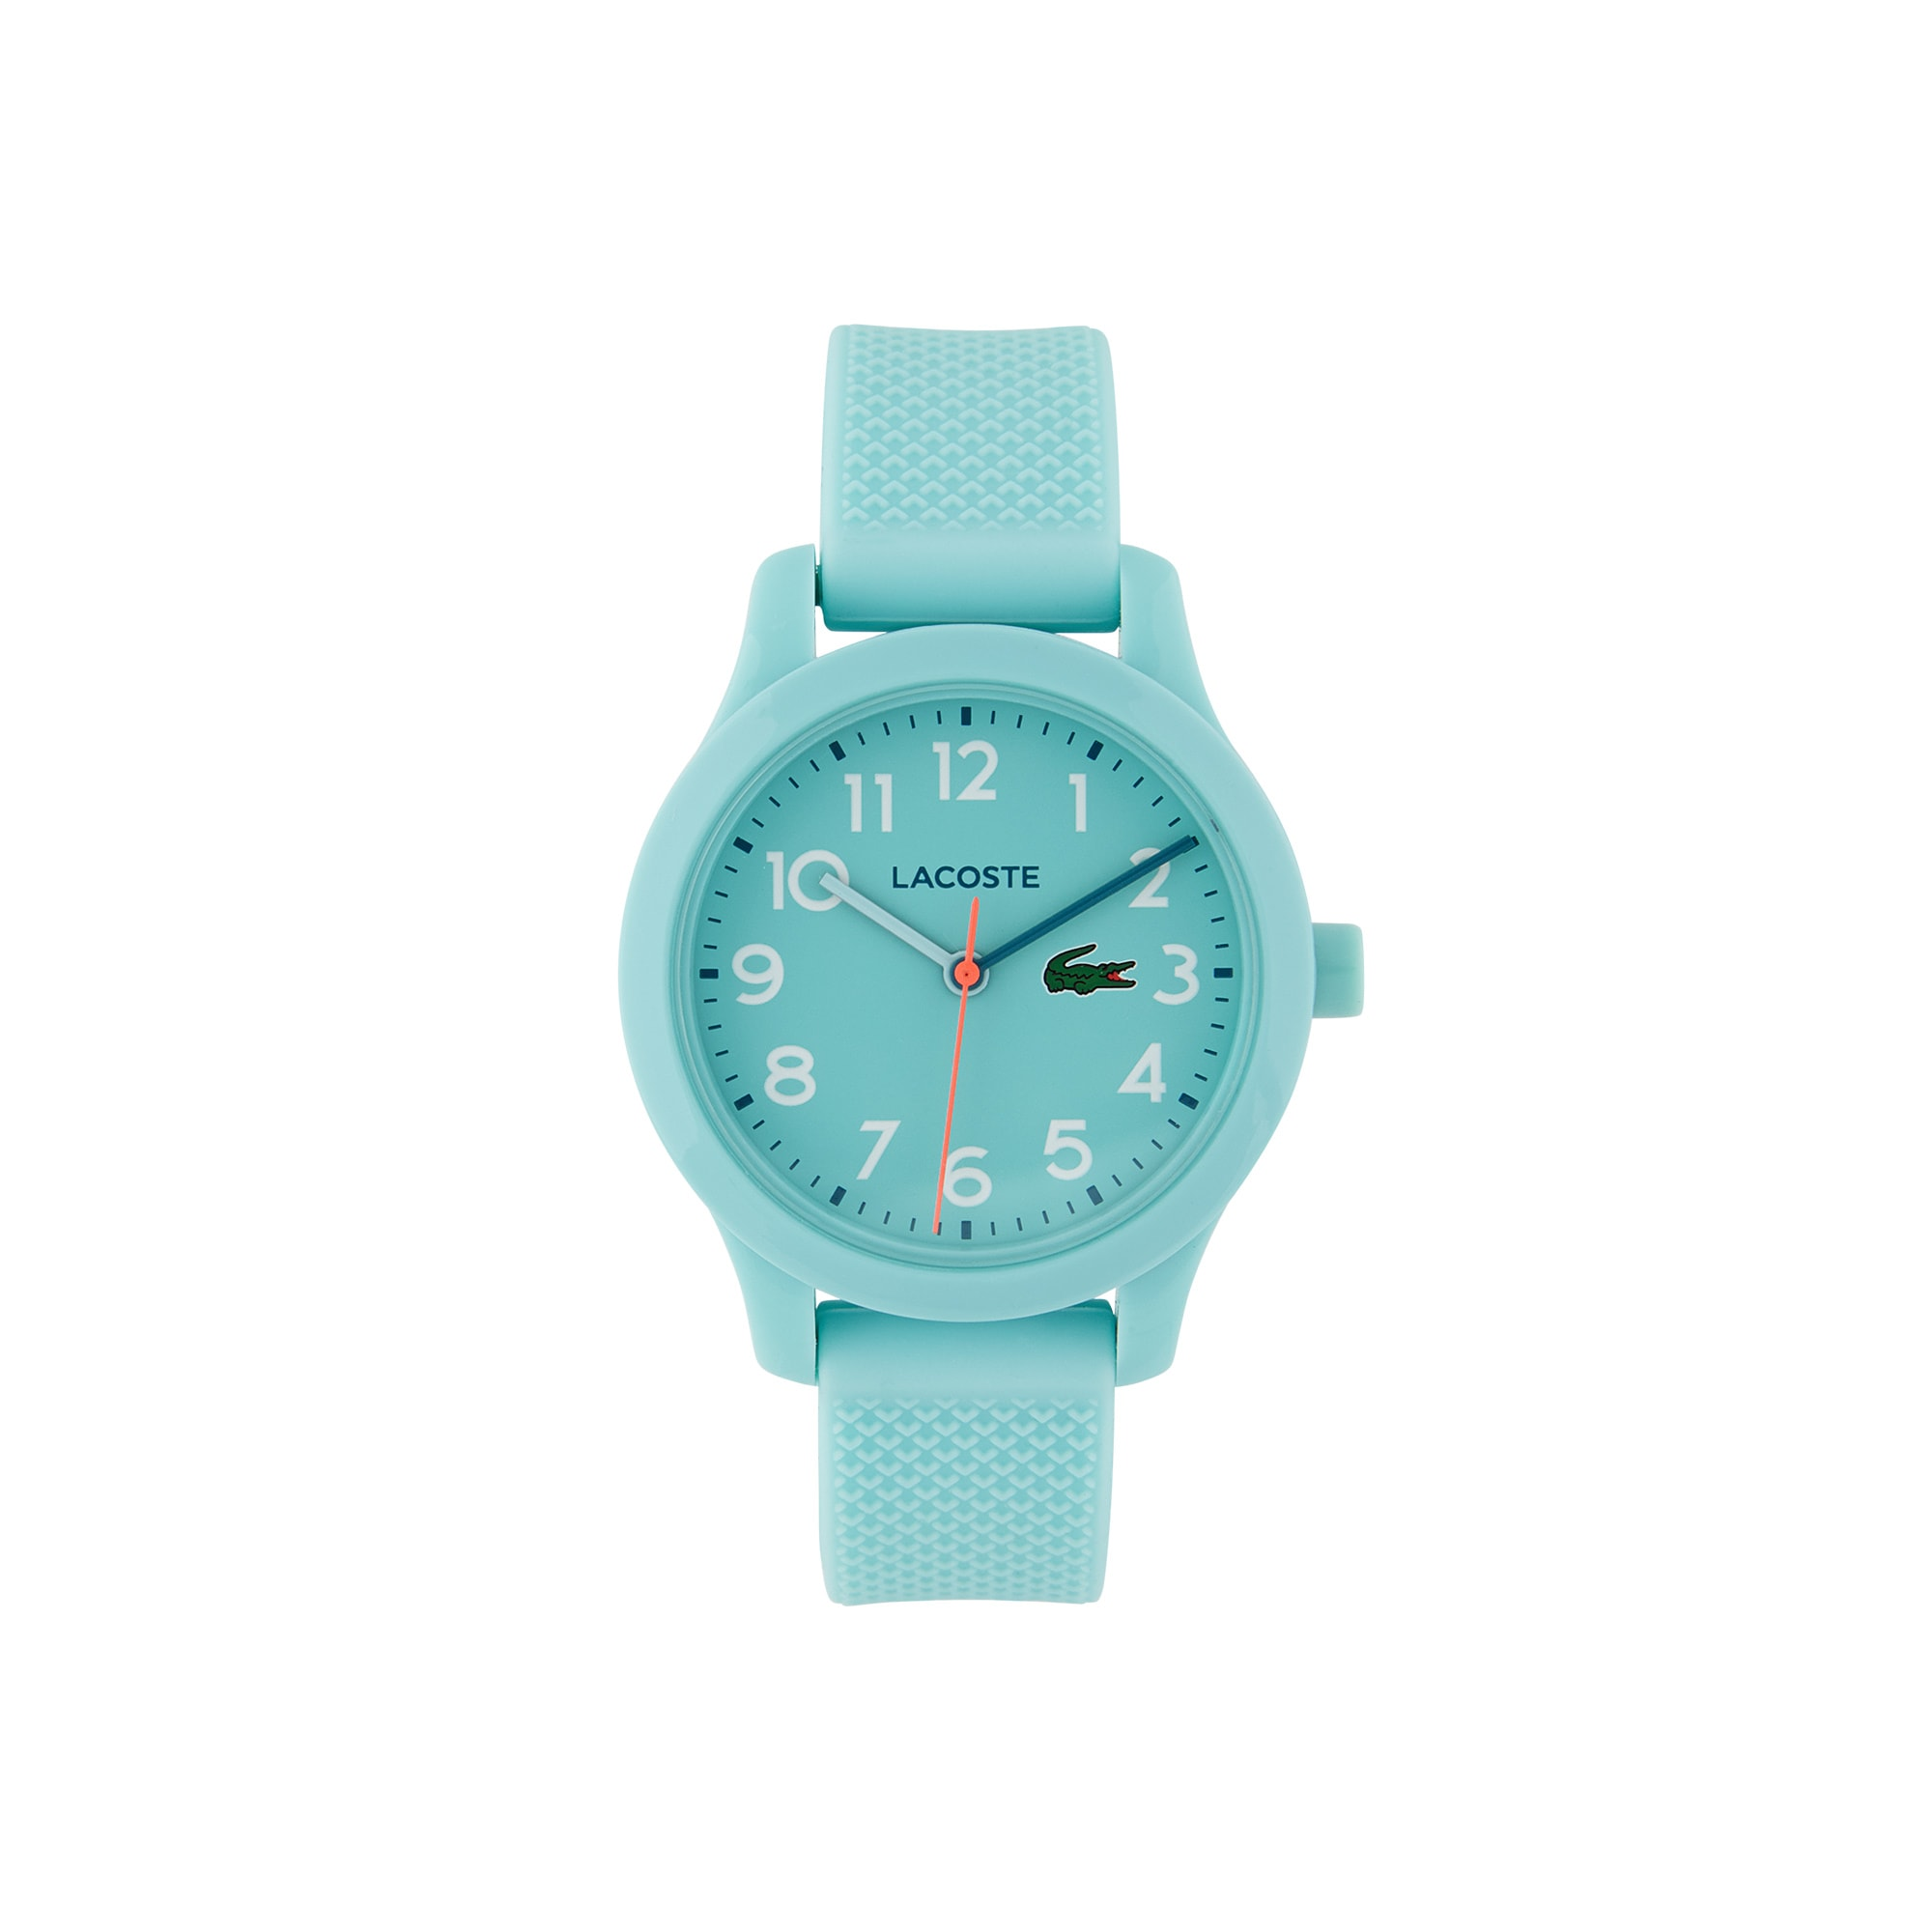 Kinderen Lacoste 12.12 Horloge met Turkoois Siliconen Armband